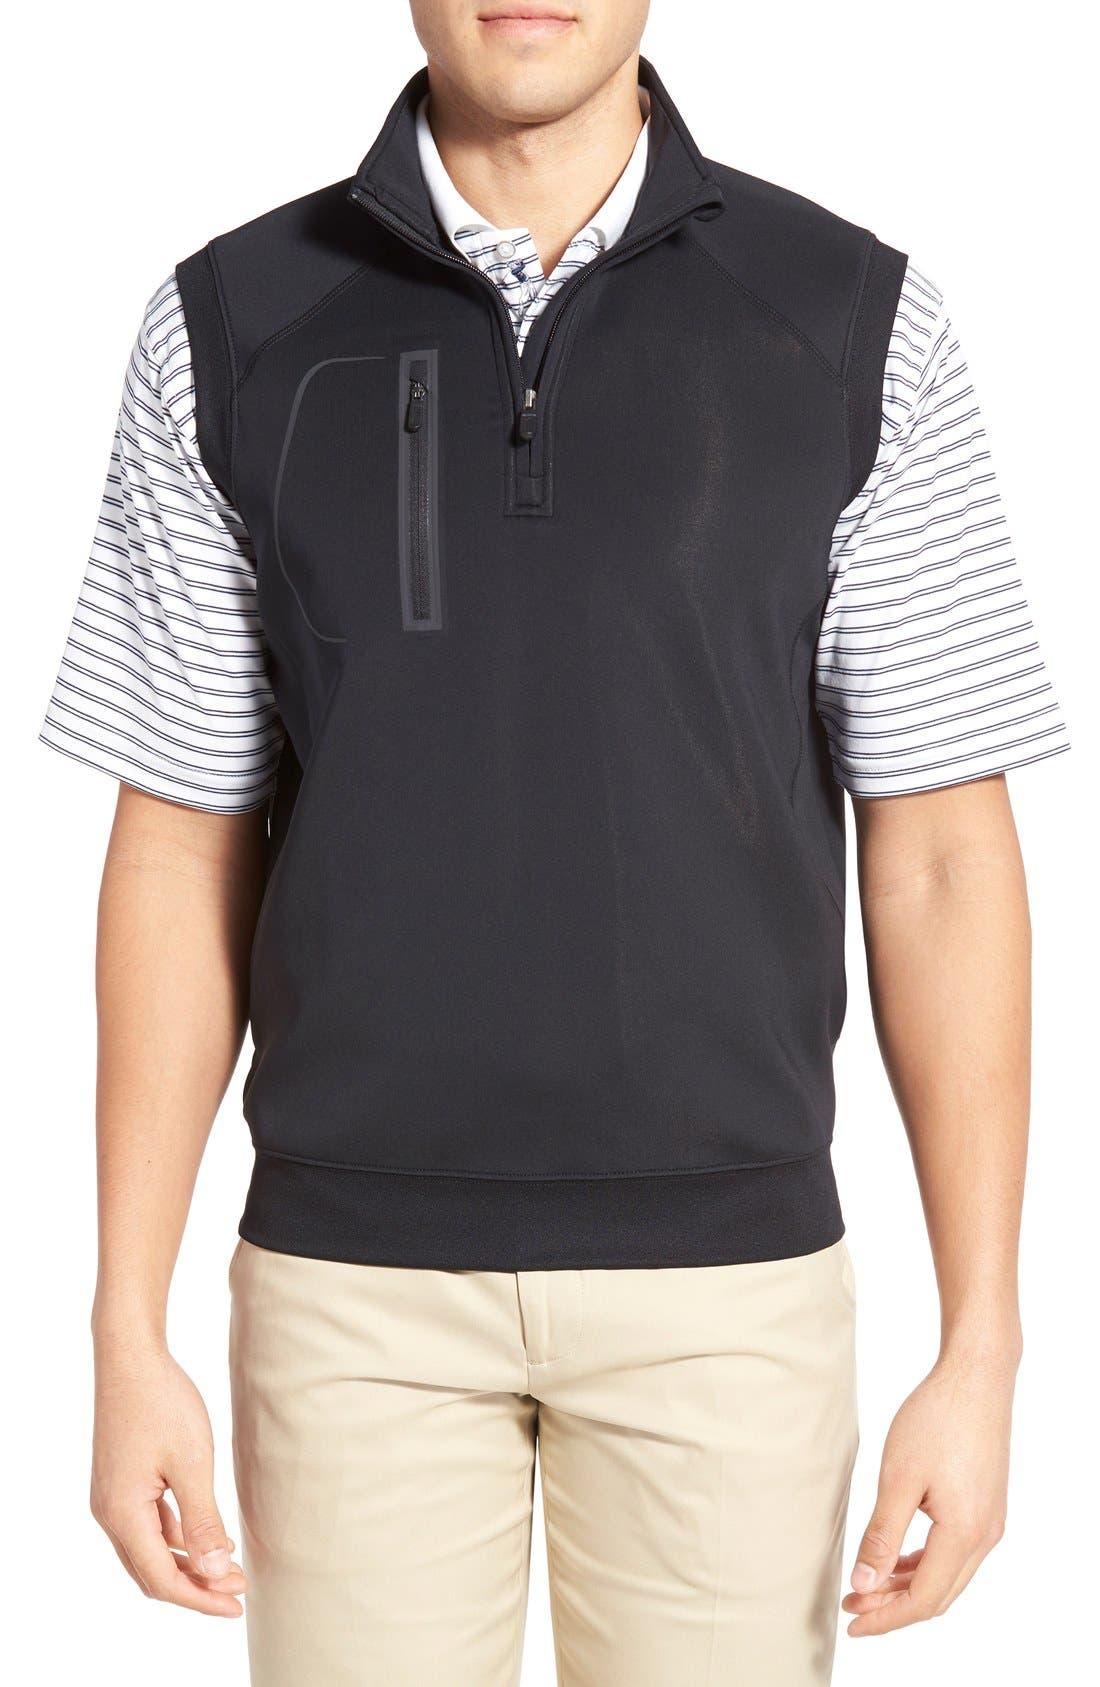 Bobby Jones XH2O Crawford Stretch Quarter Zip Golf Vest